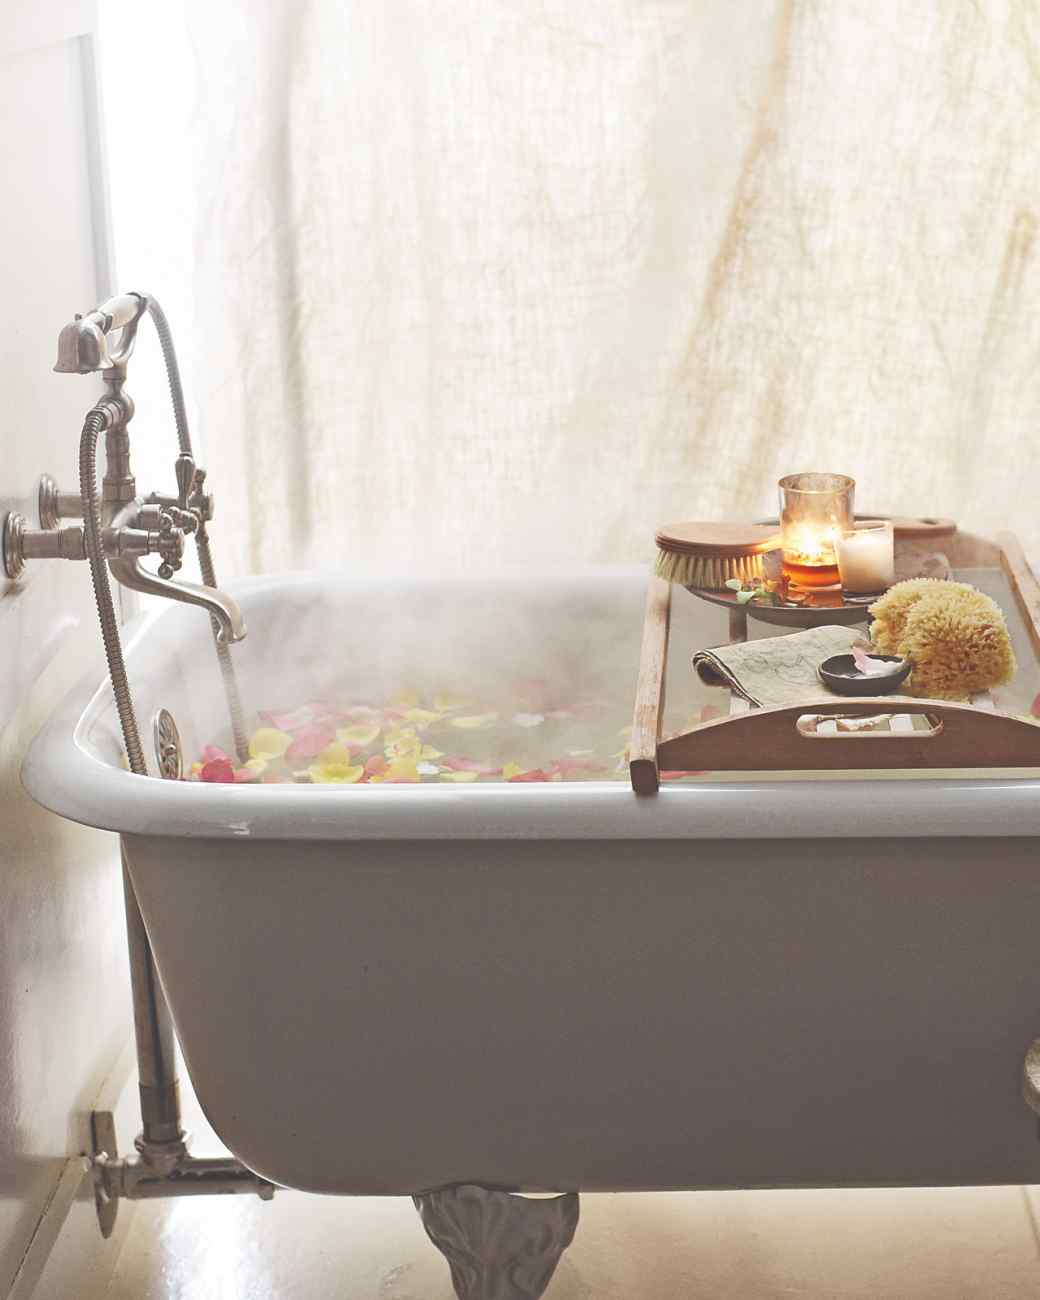 bathtub-mbd106453_vert.jpg